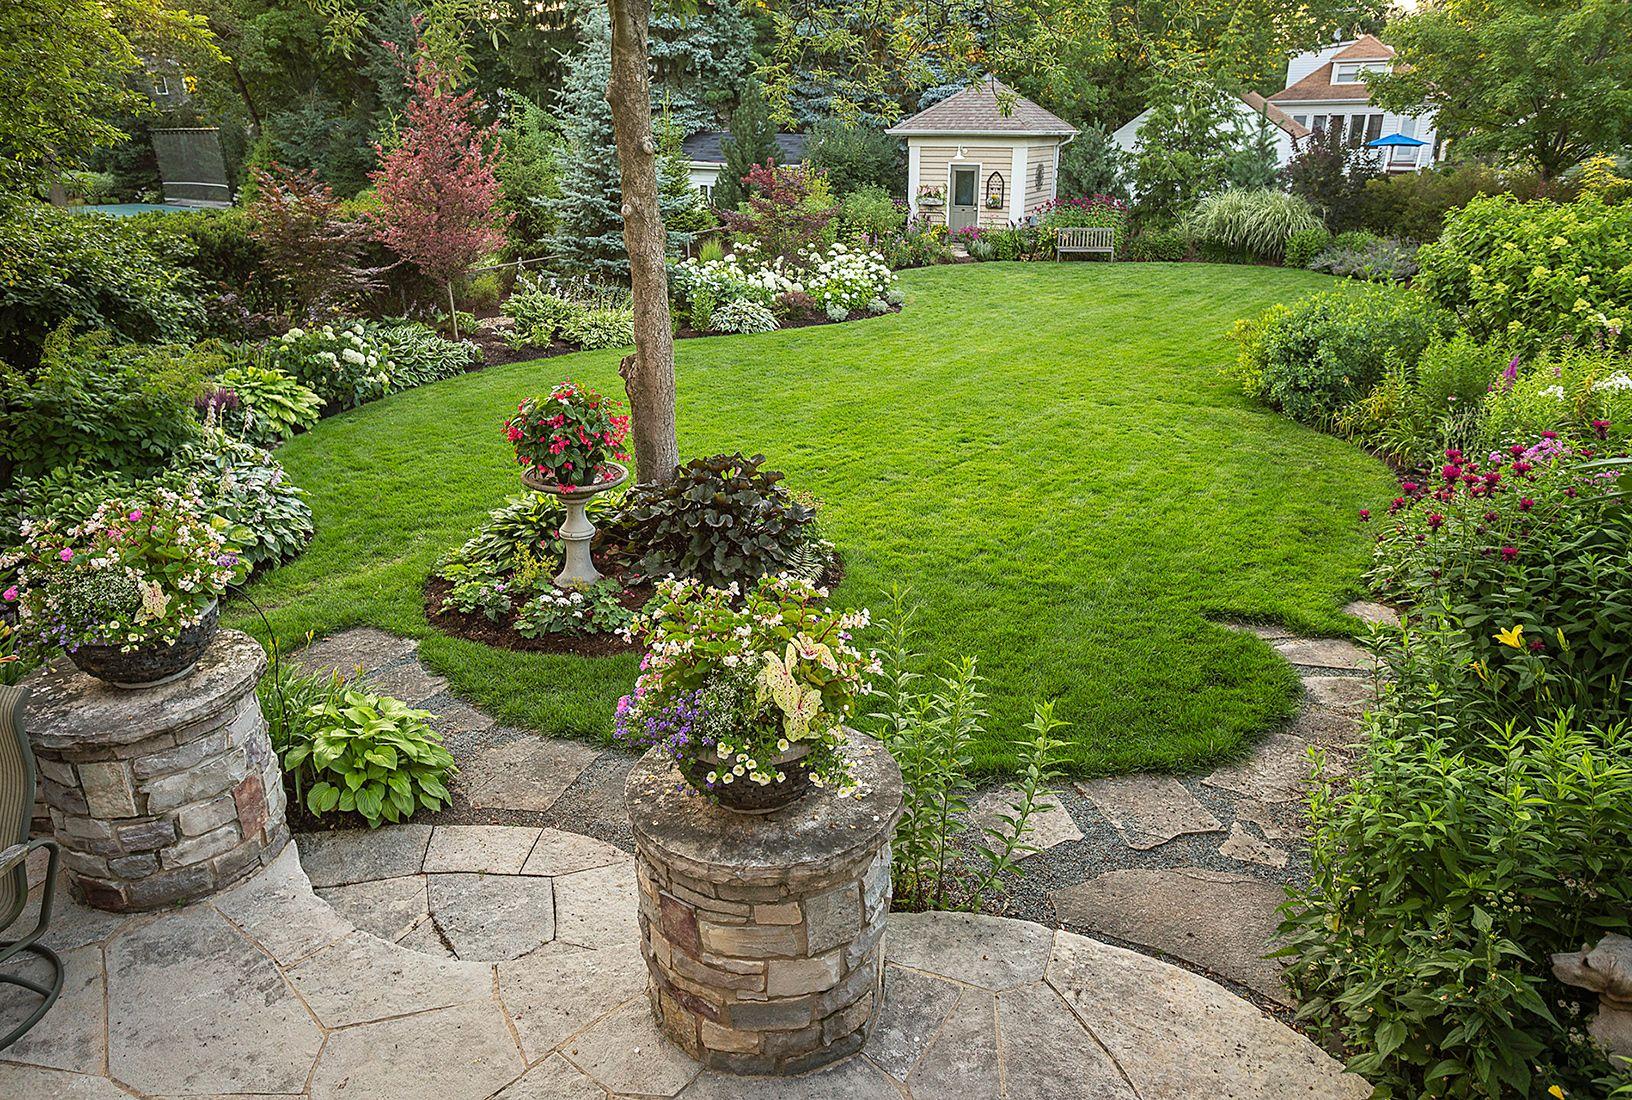 This Garden Was Designed With Dogs In Mind Backyard Landscaping Designs Landscape Design Dog Friendly Garden